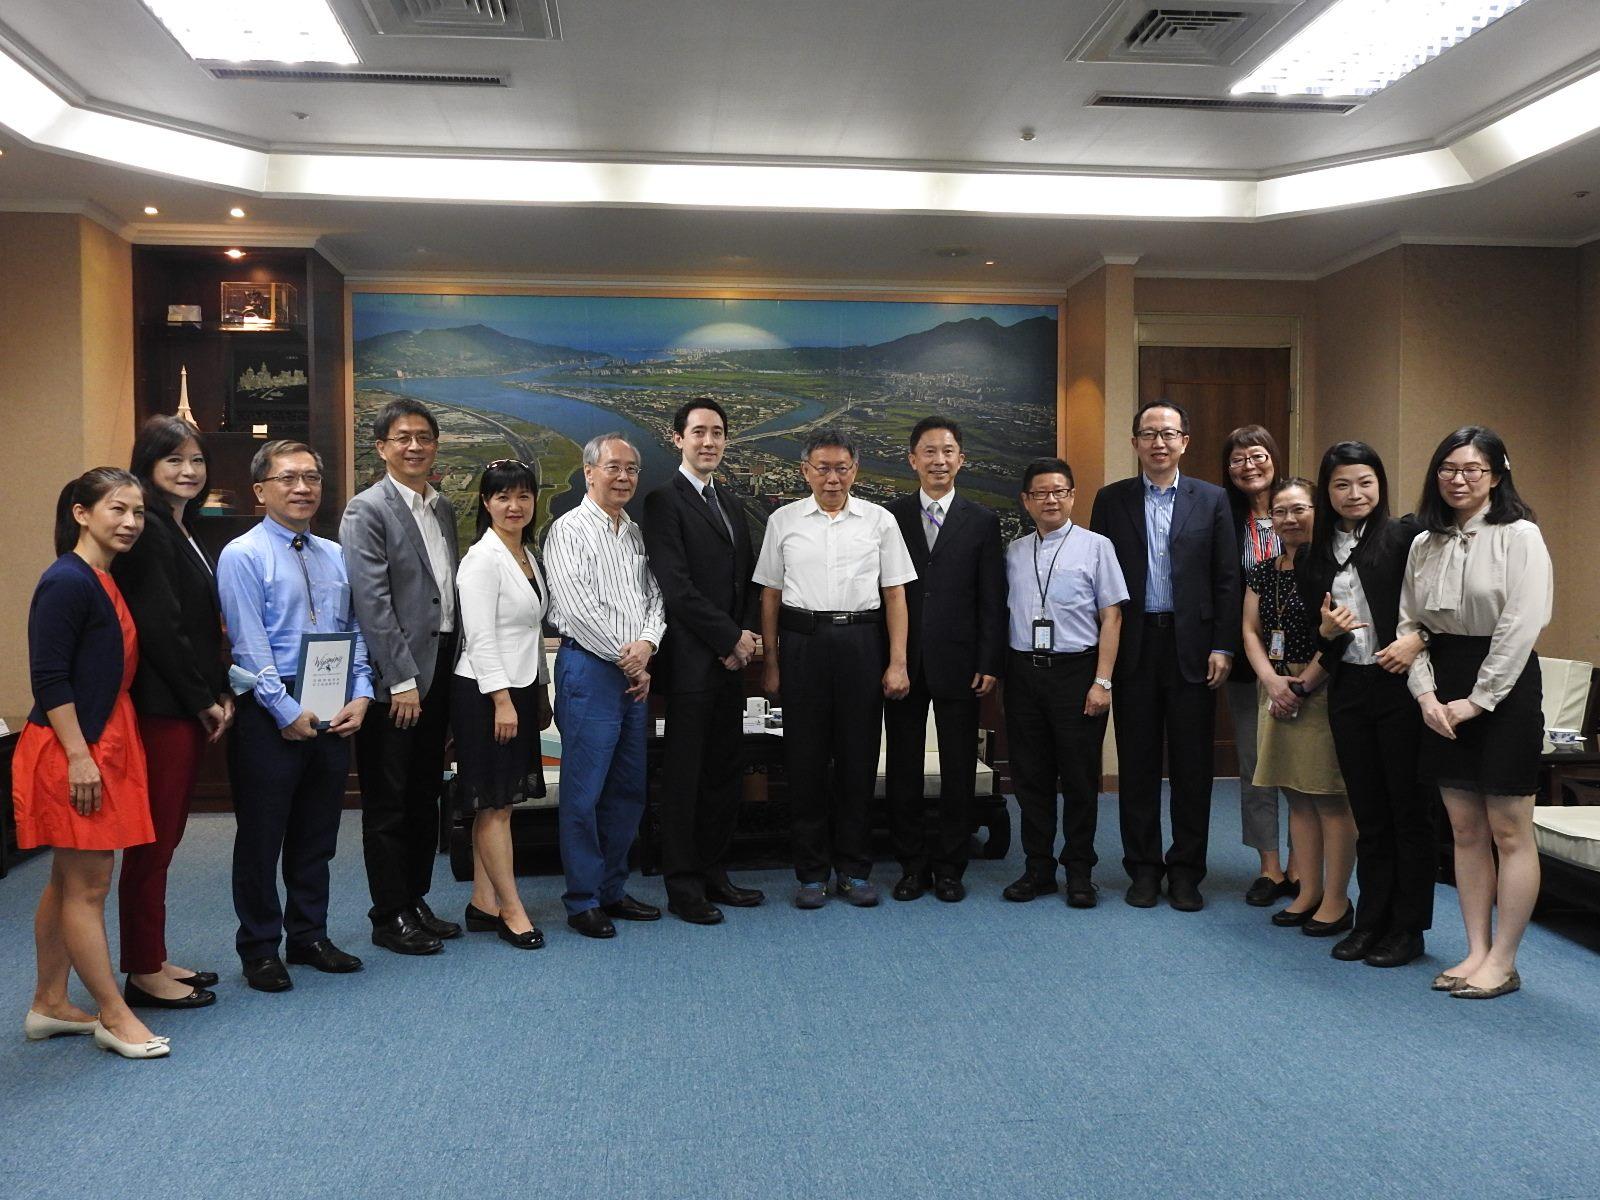 Representatives of the American State Offices Association (ASOA) Visit Mayor Ko